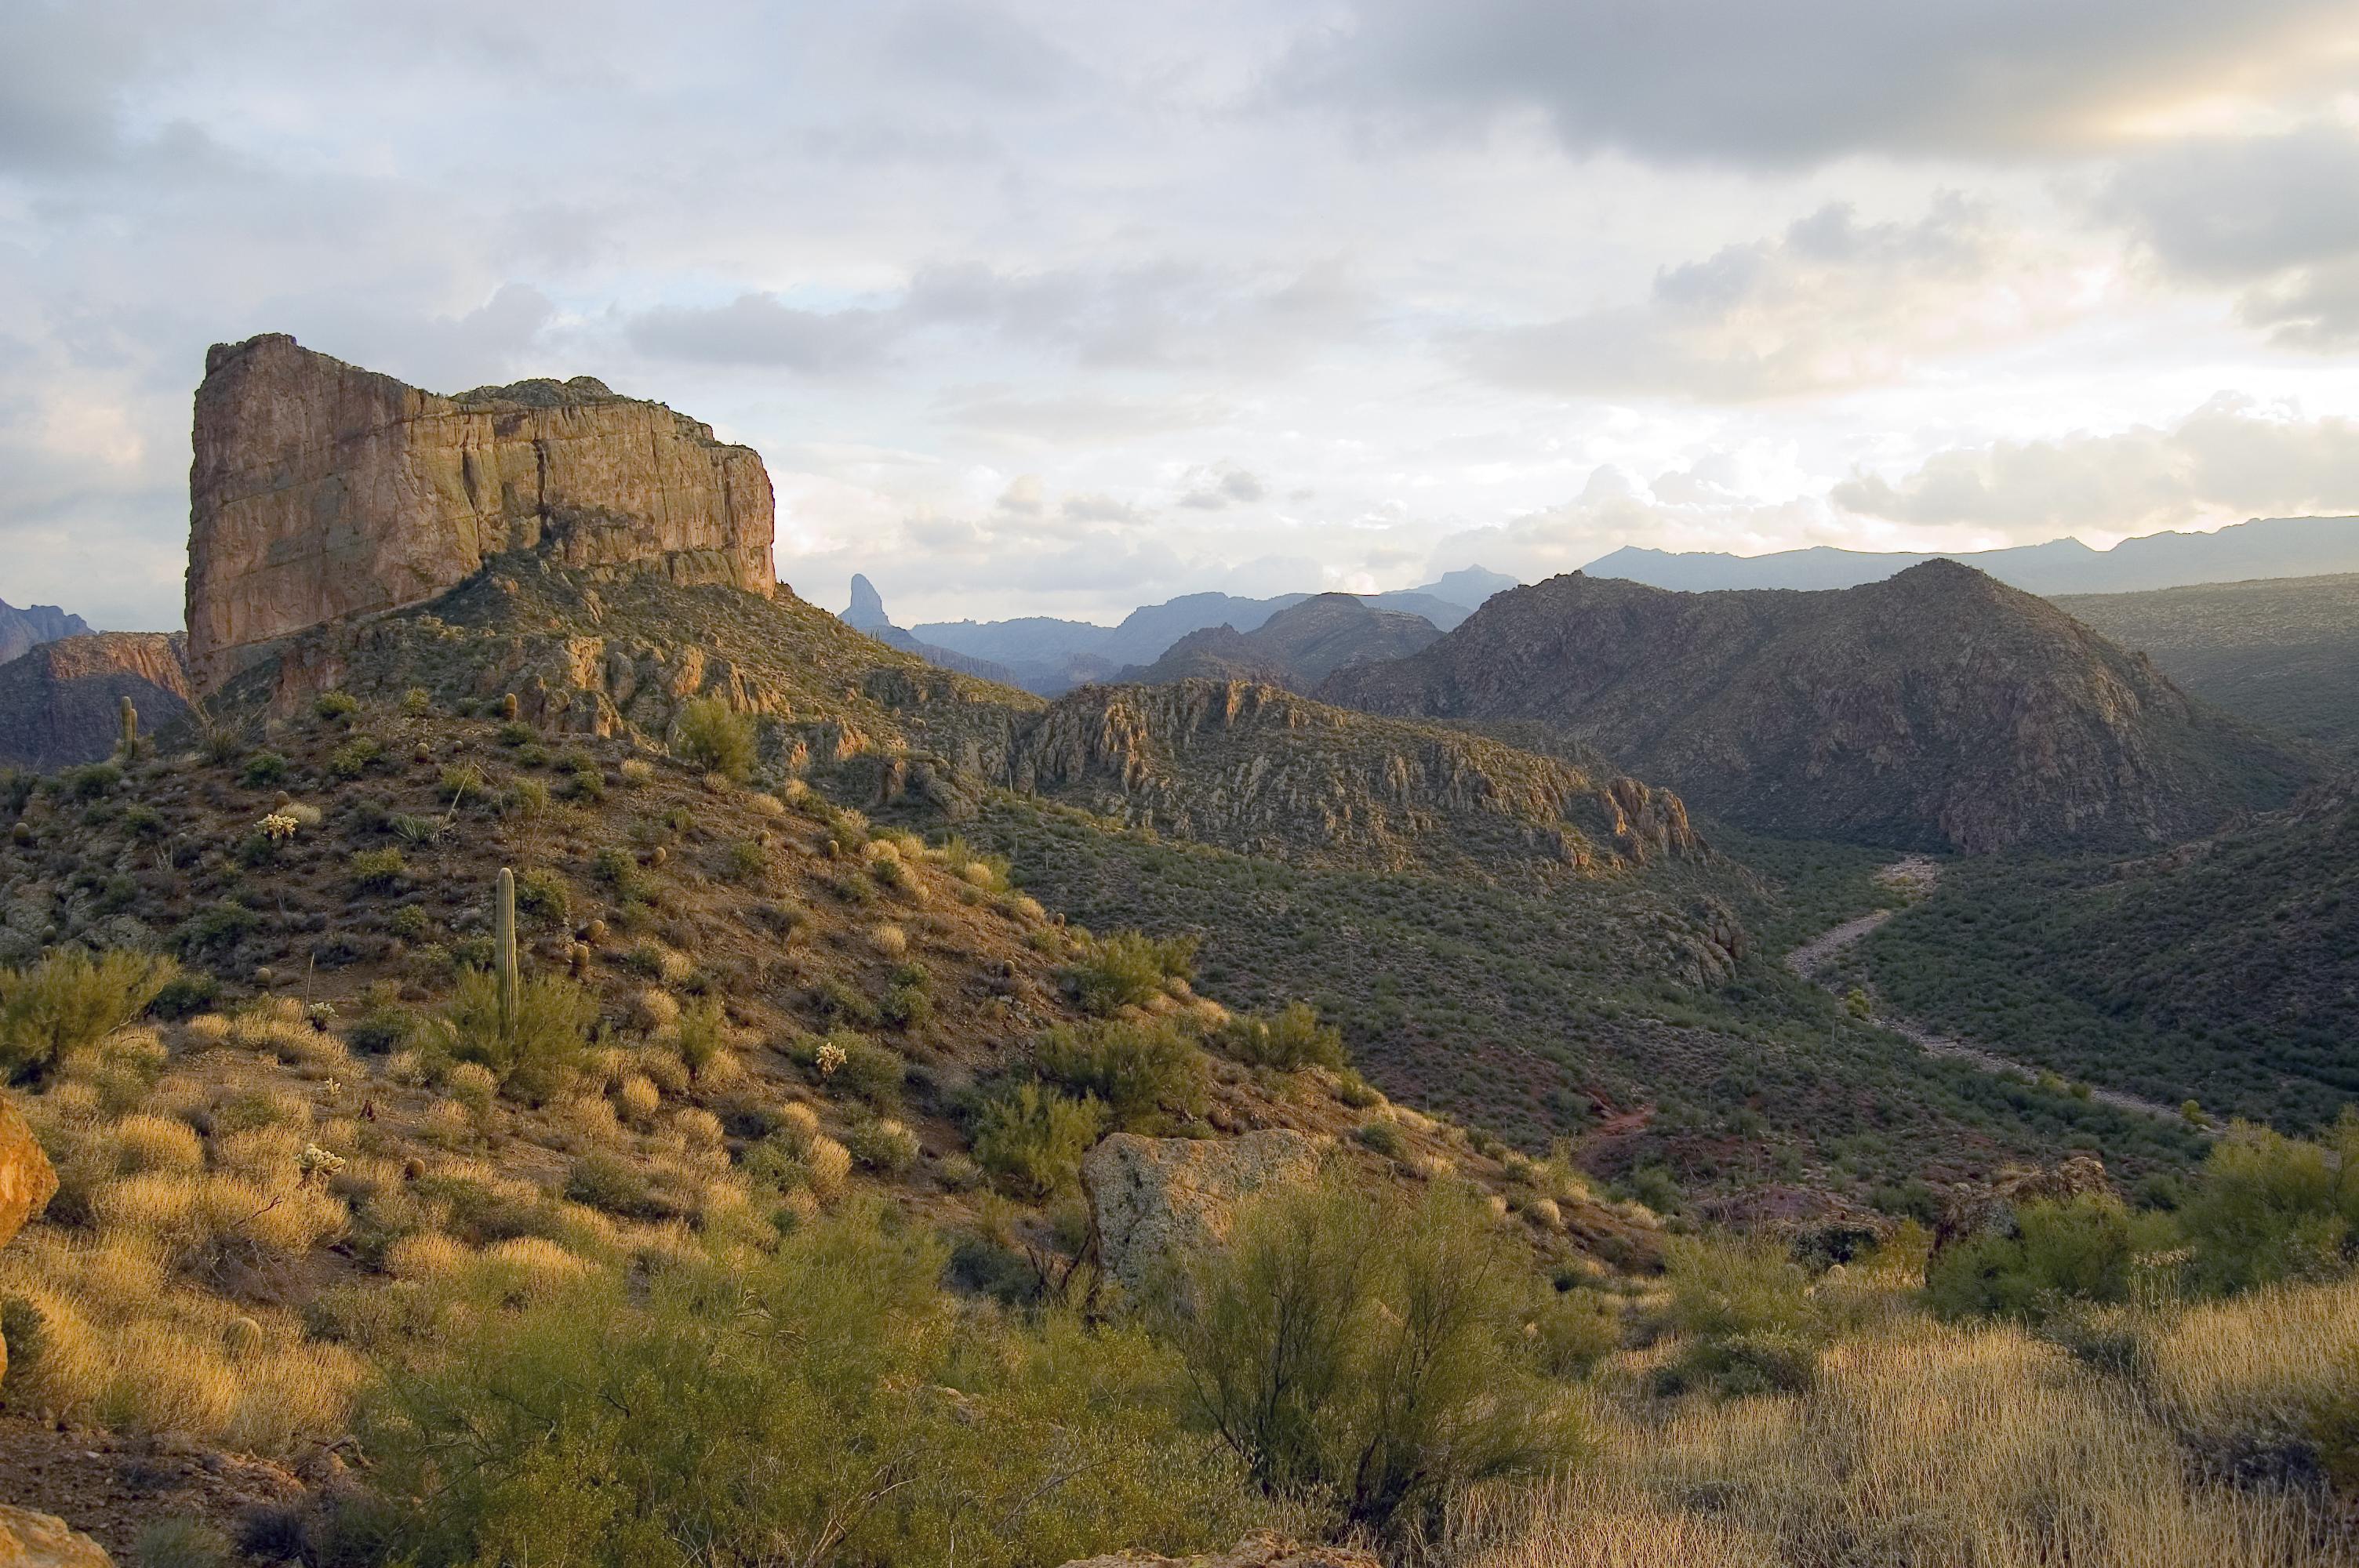 Battleship Mountain - Superstition Wilderness, Arizona